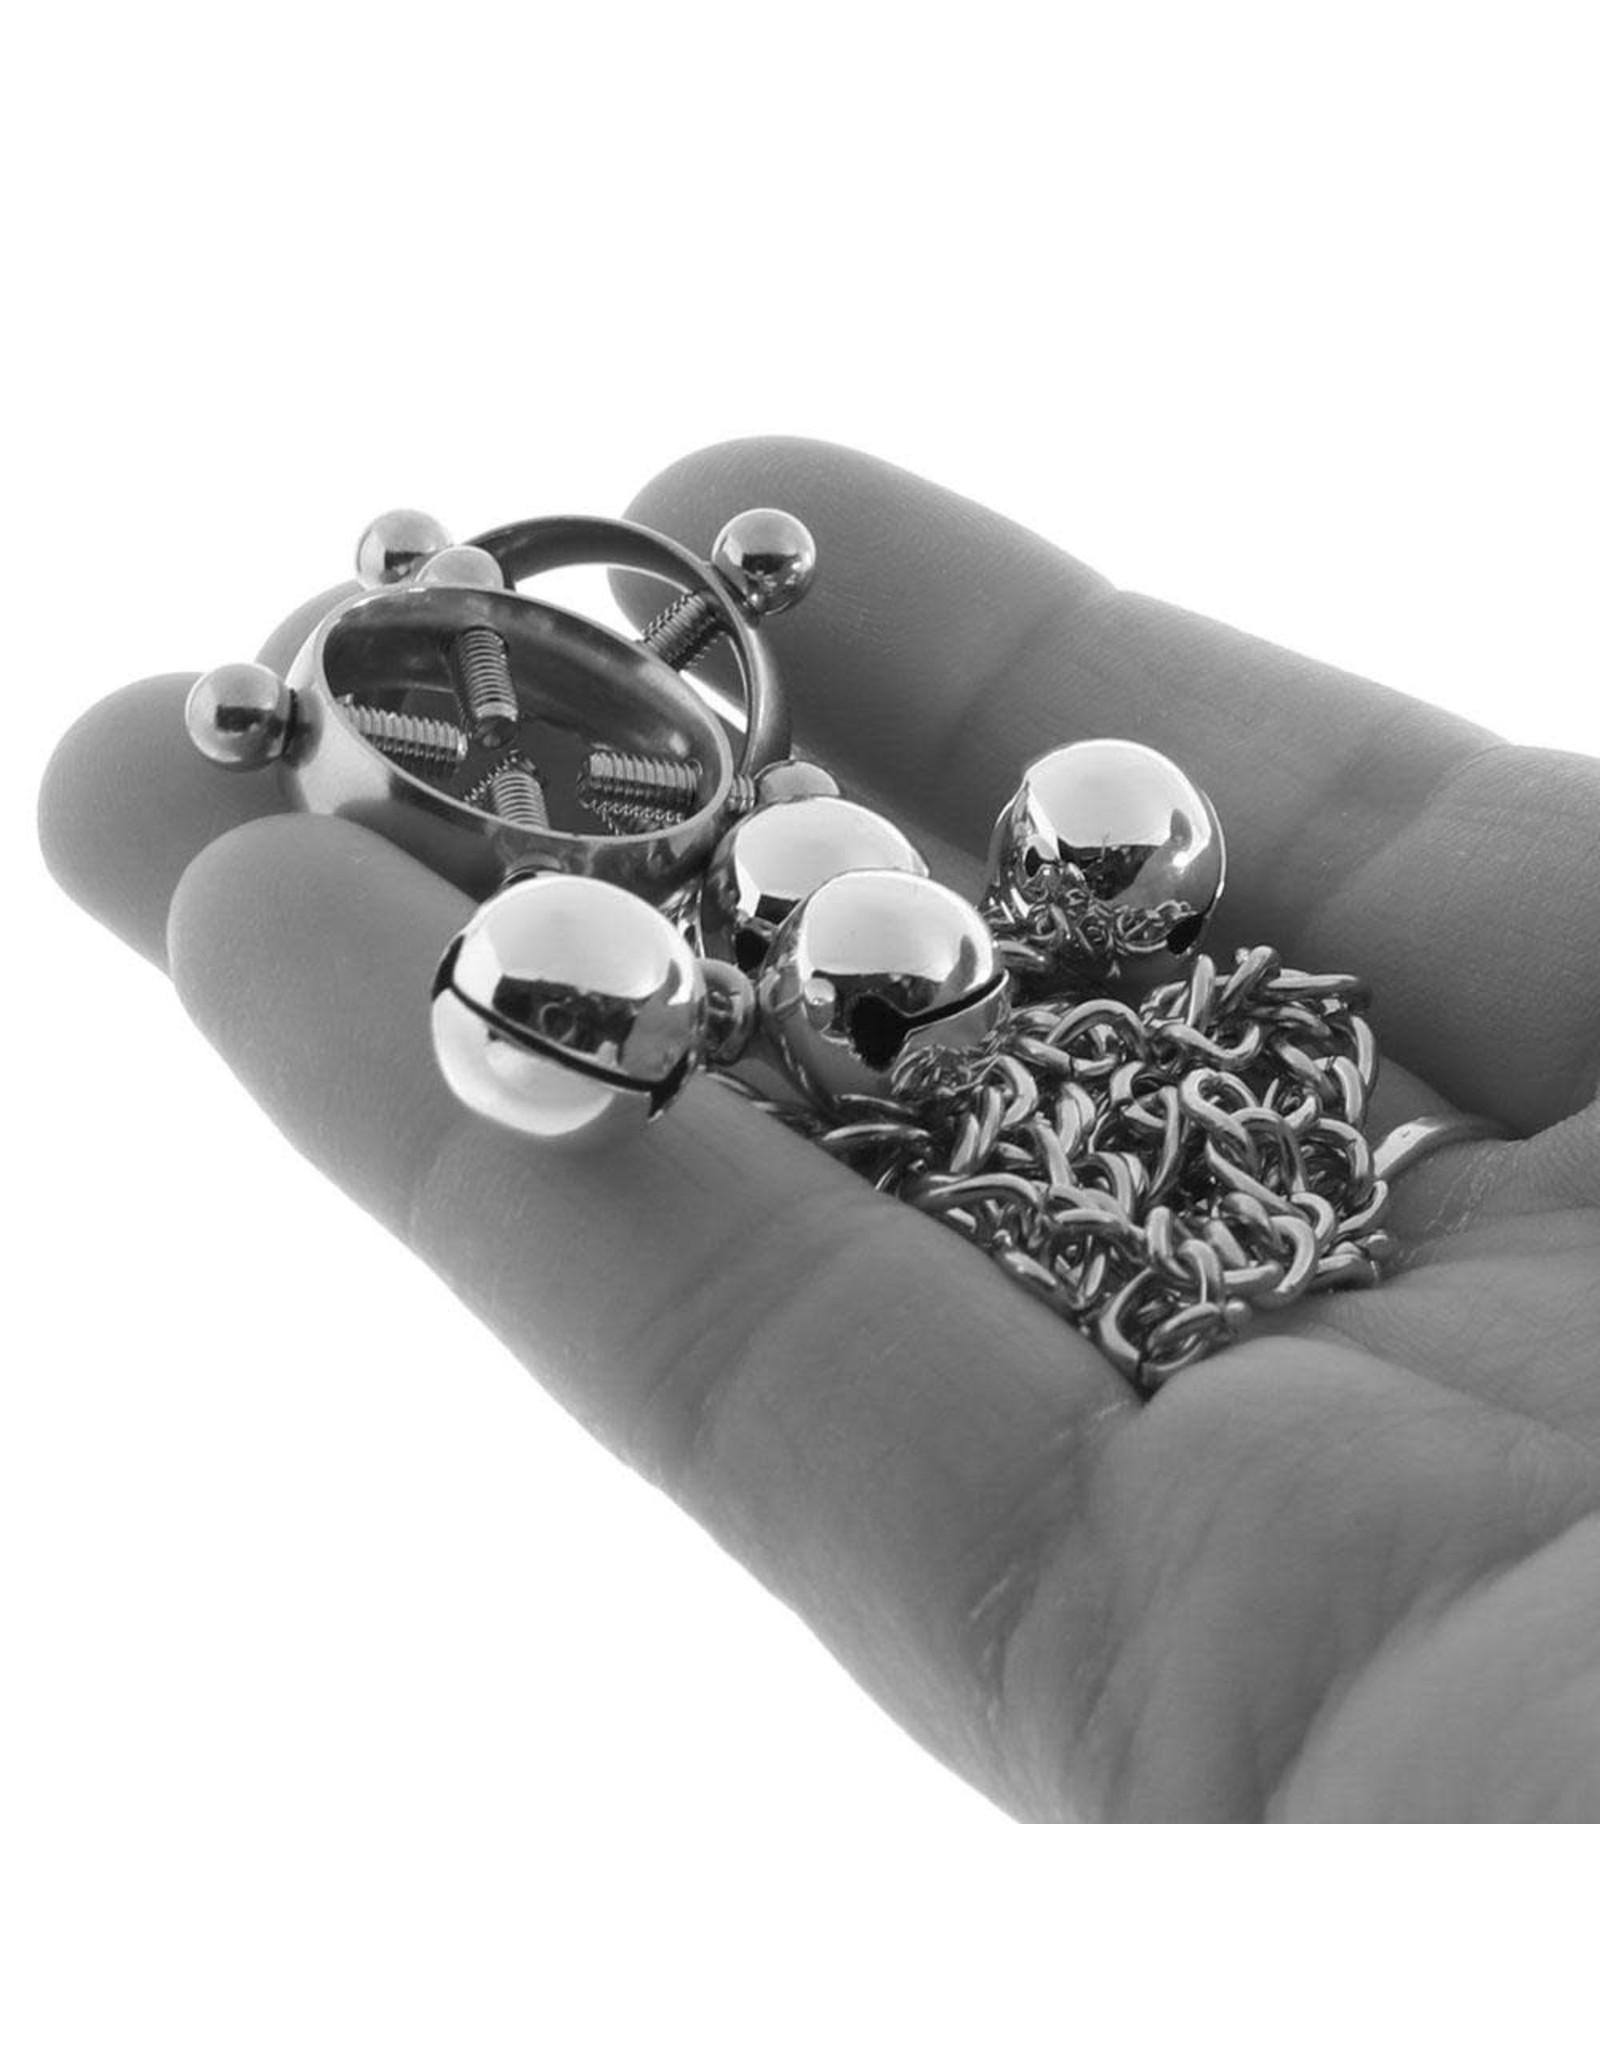 Calexotics Calexotics - Nipple Grips 4 Point Nipple Press with Bells